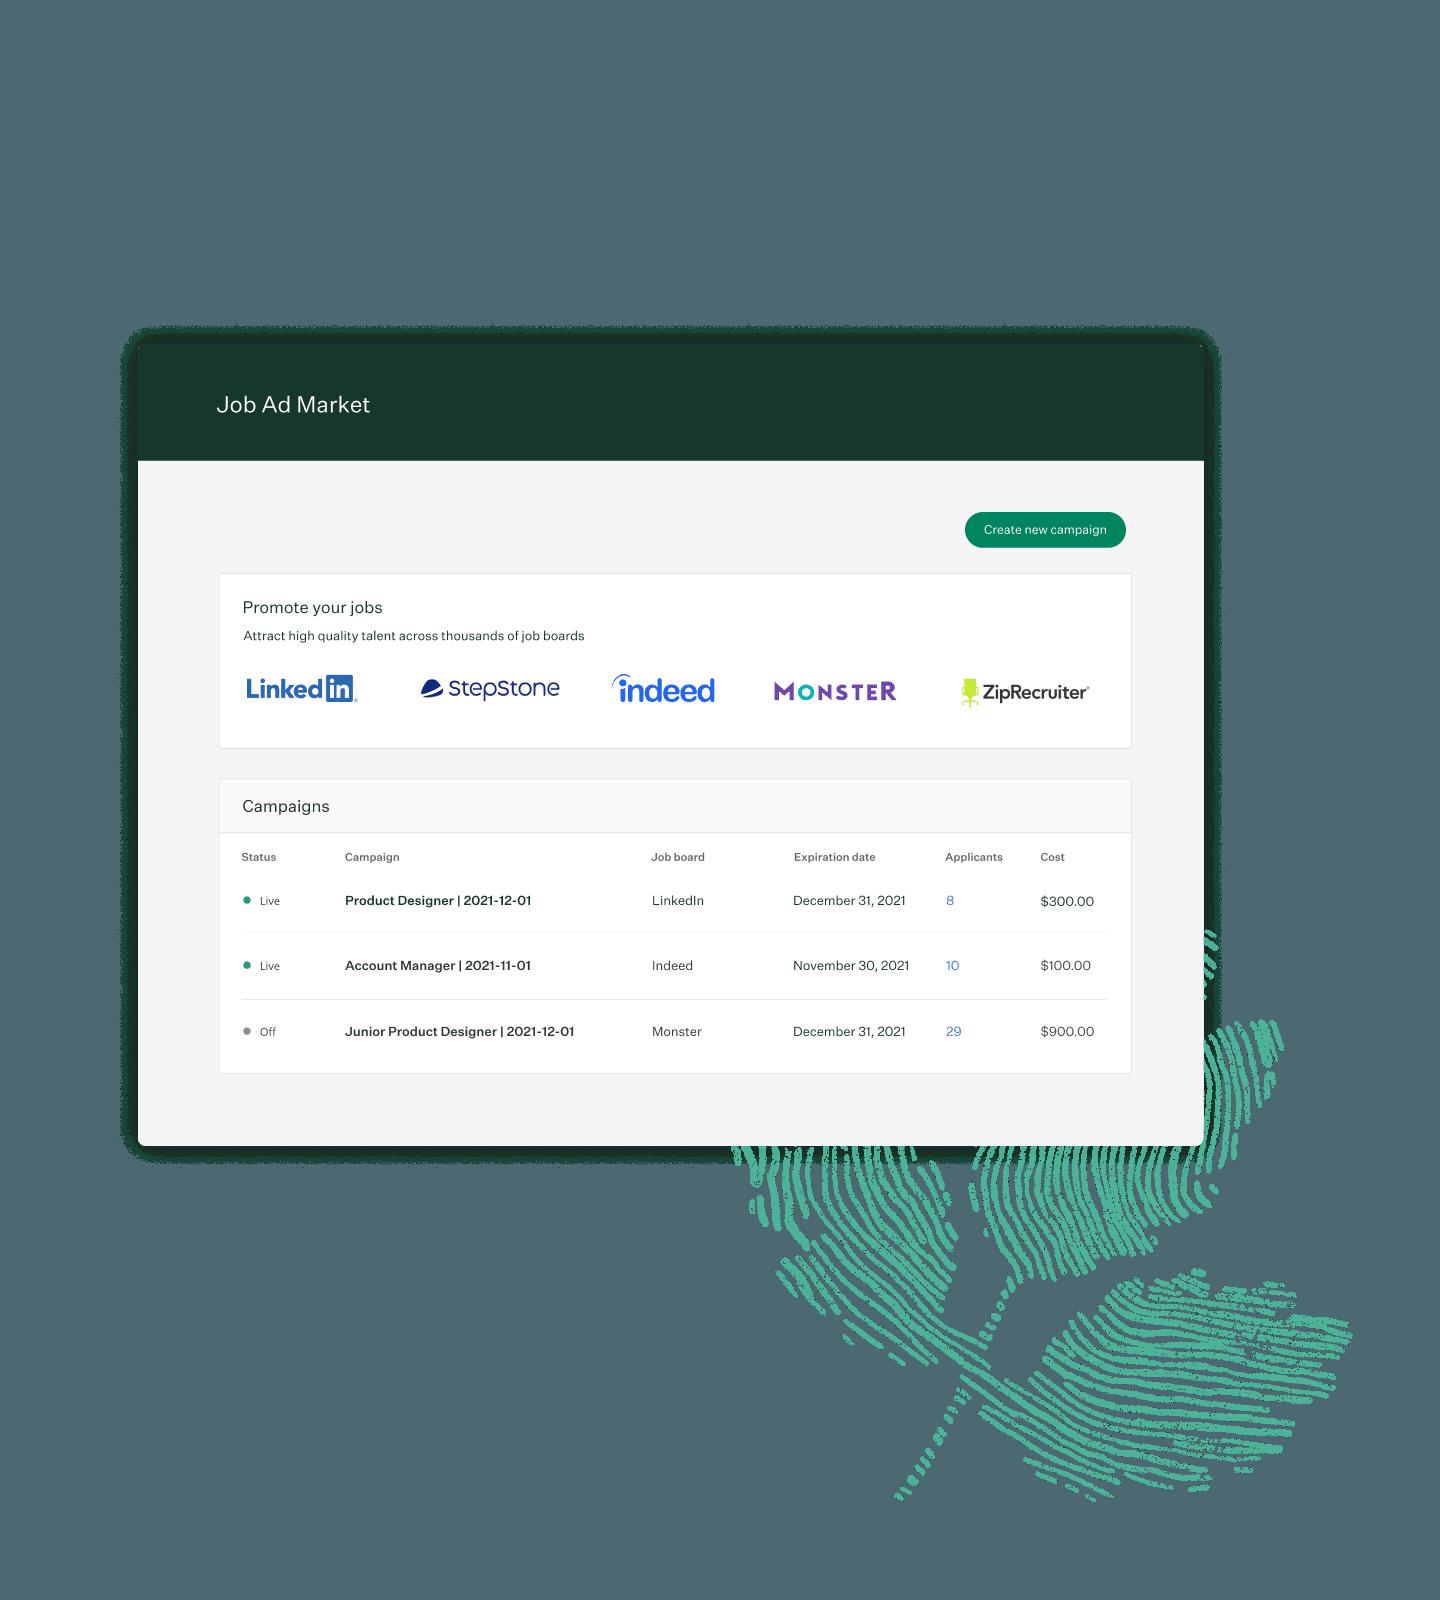 Image of Greenhouse Job Ad Market interface